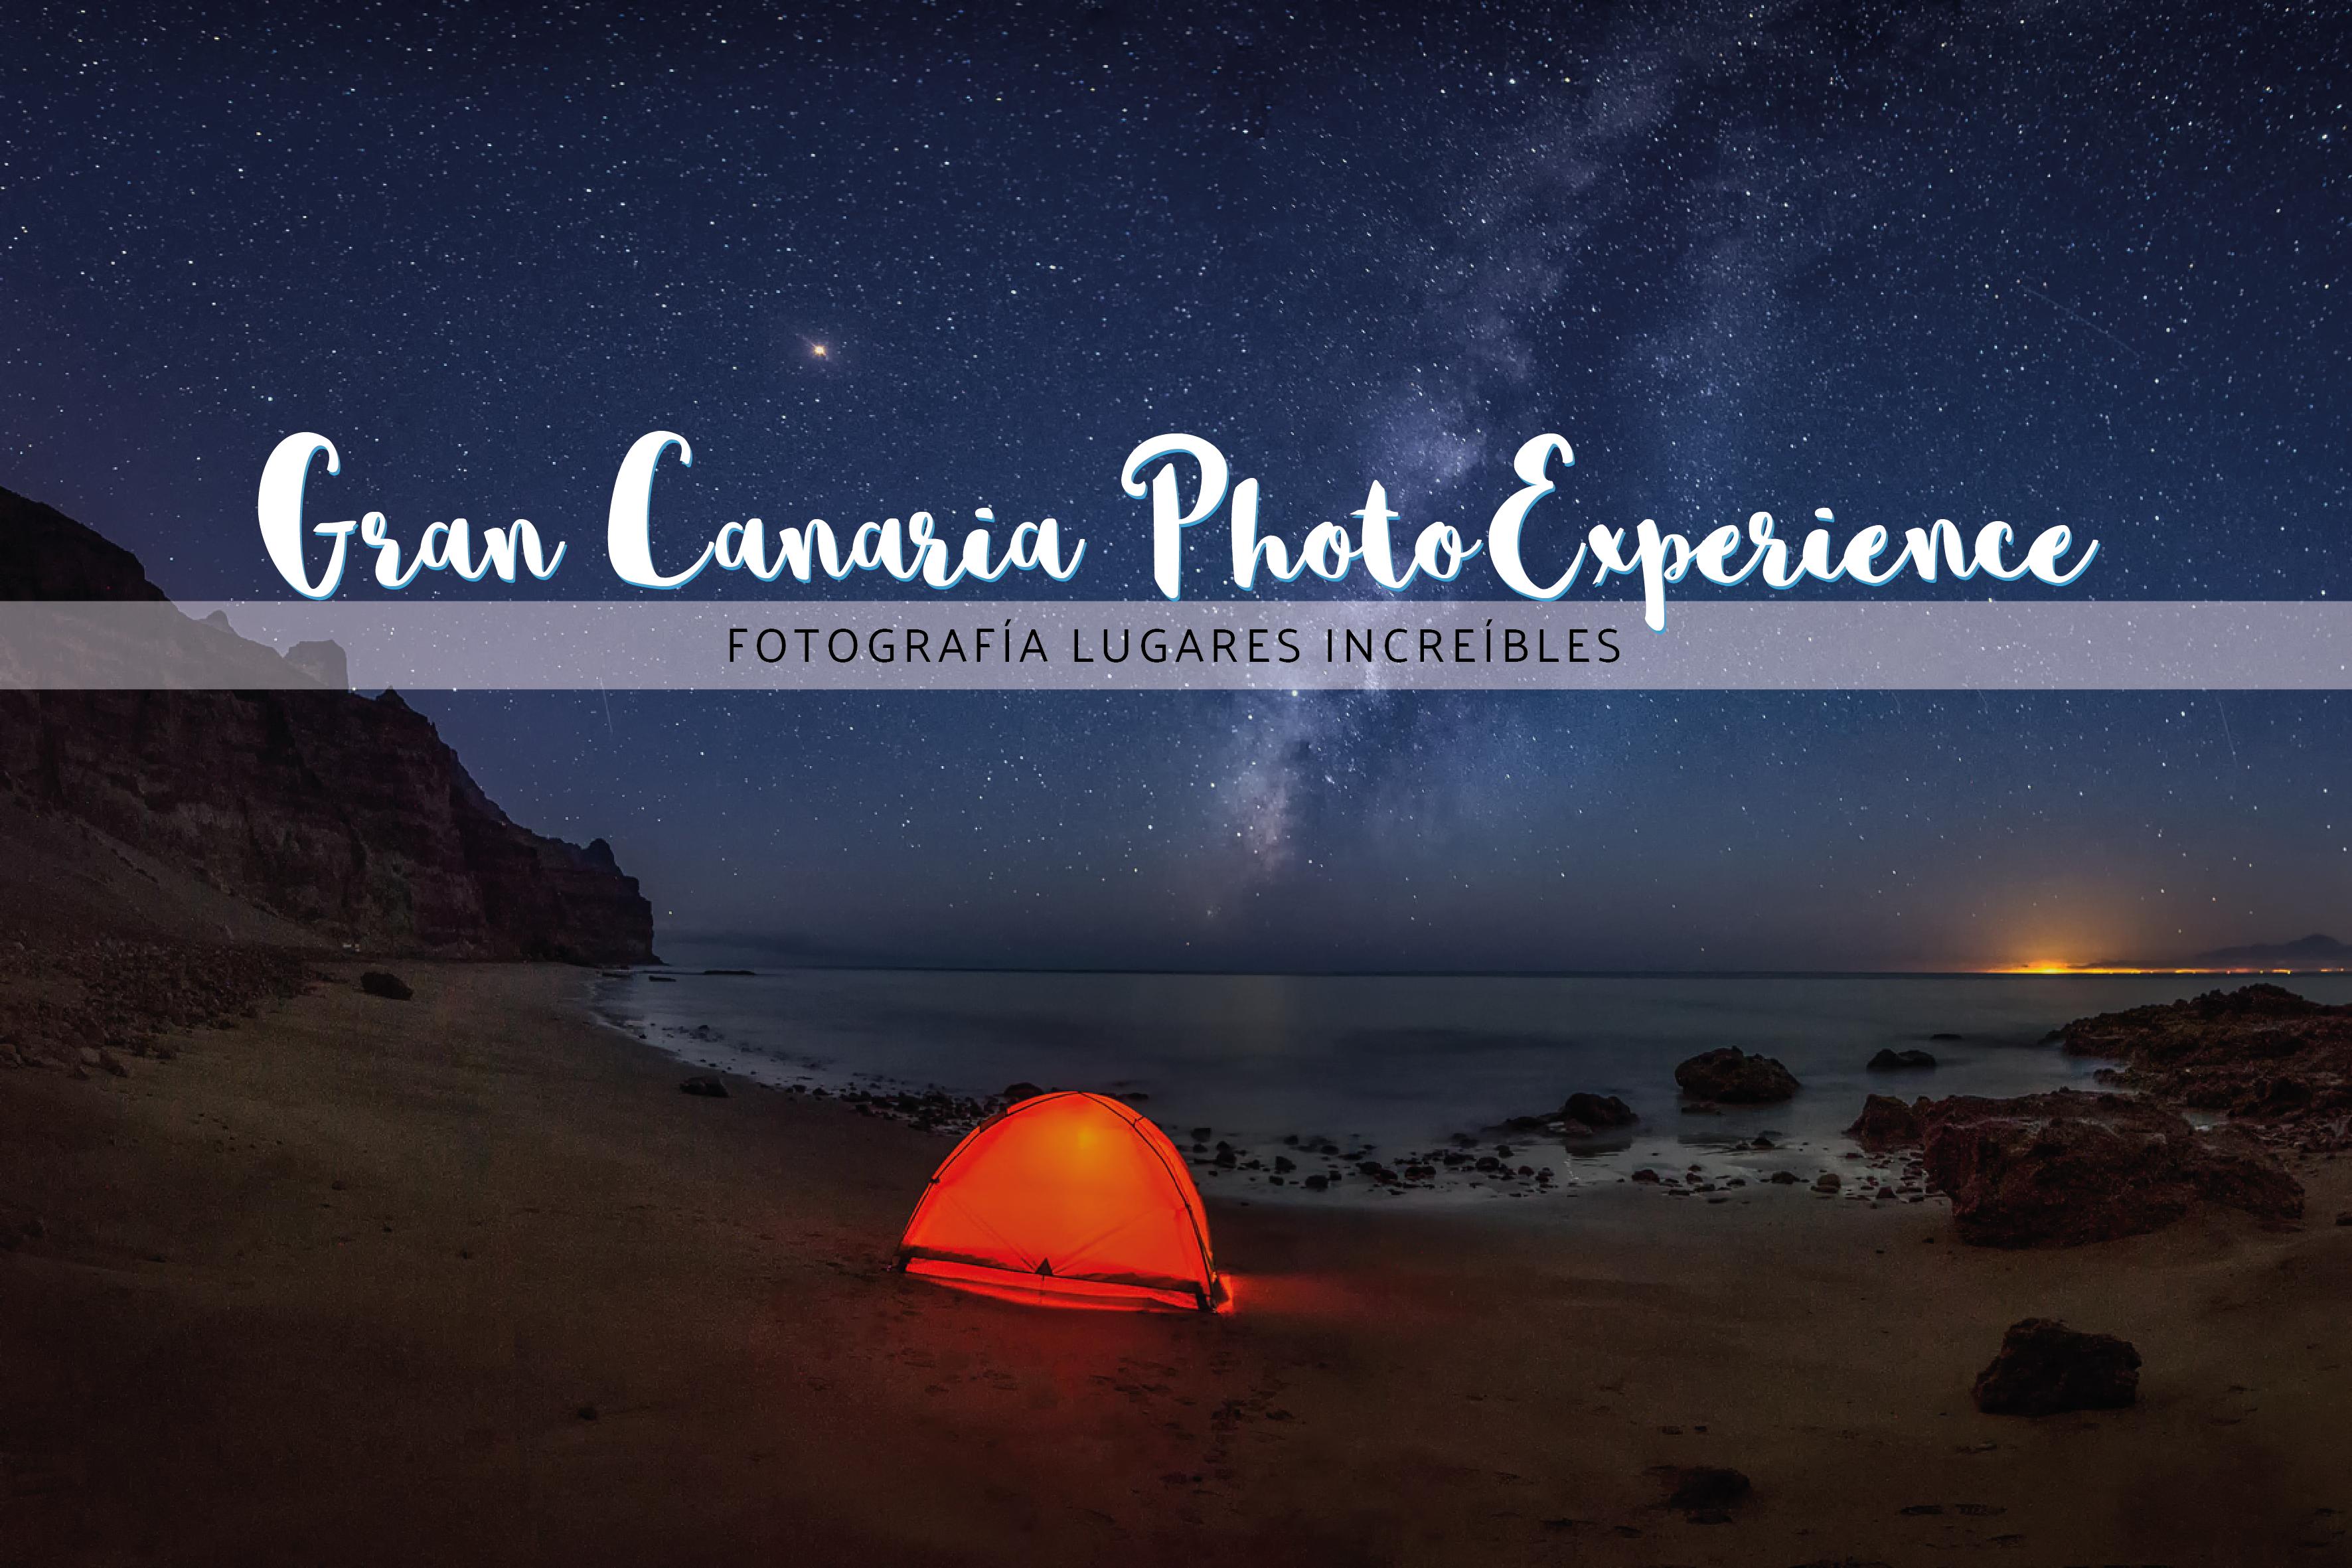 Gran Canaria PhotoExperience